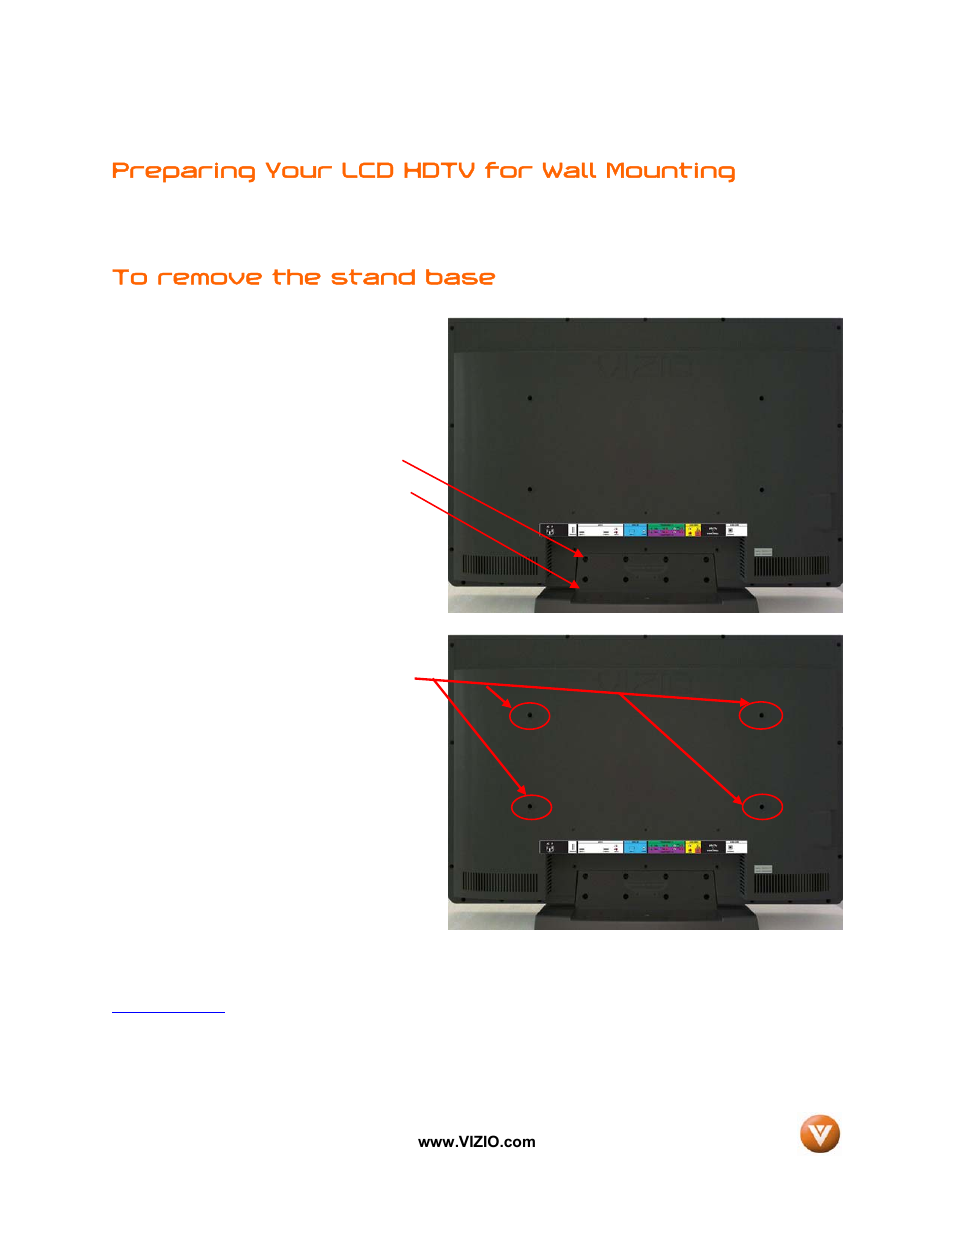 preparing your lcd hdtv for wall mounting vizio vw32l user manual rh manualsdir com vizio vw32l hdtv20a user manual Vizio VW32L No